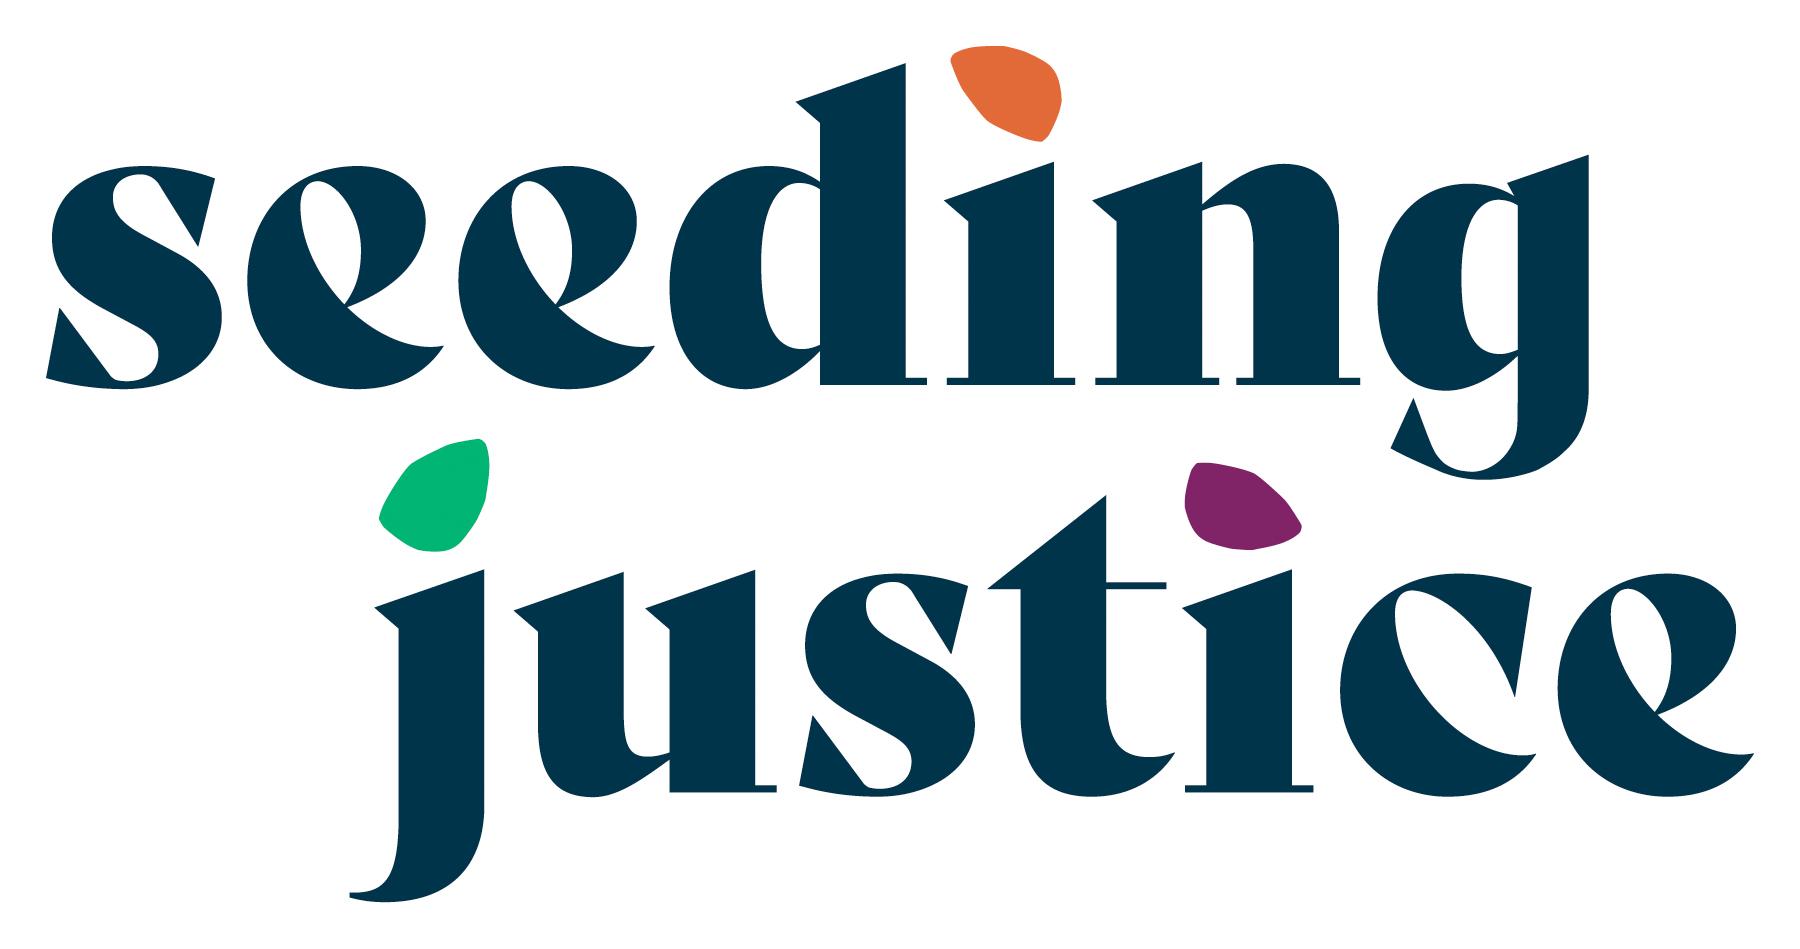 The Seeding Justice logo